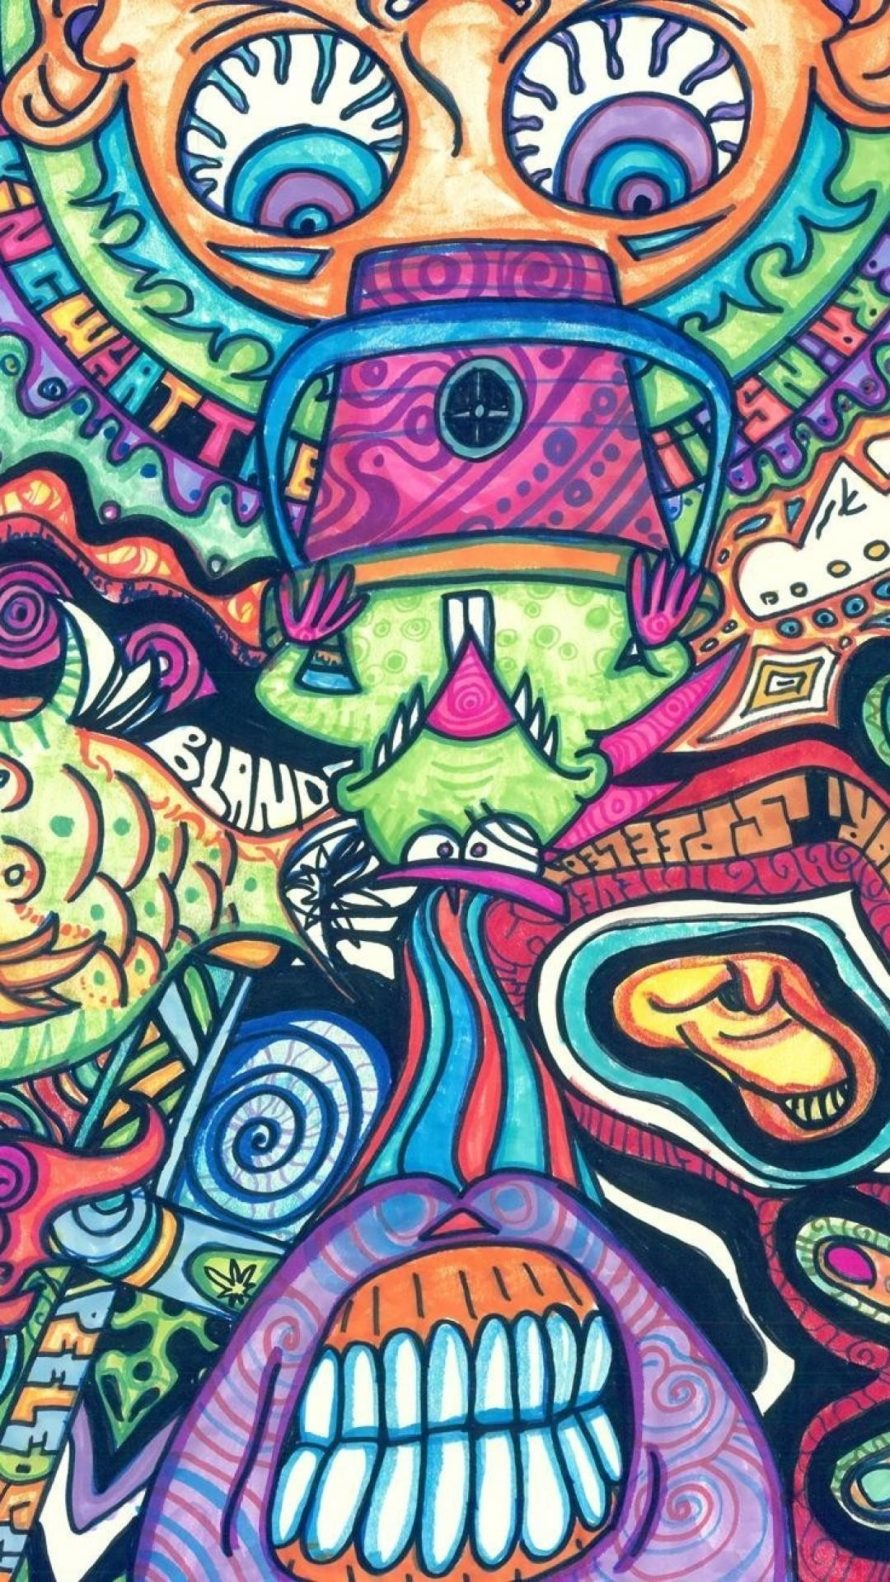 Stoner Wallpapers Iphone Stoner Wallpaper Hd Iphone 3212649 Hd Wallpaper Backgrounds Download